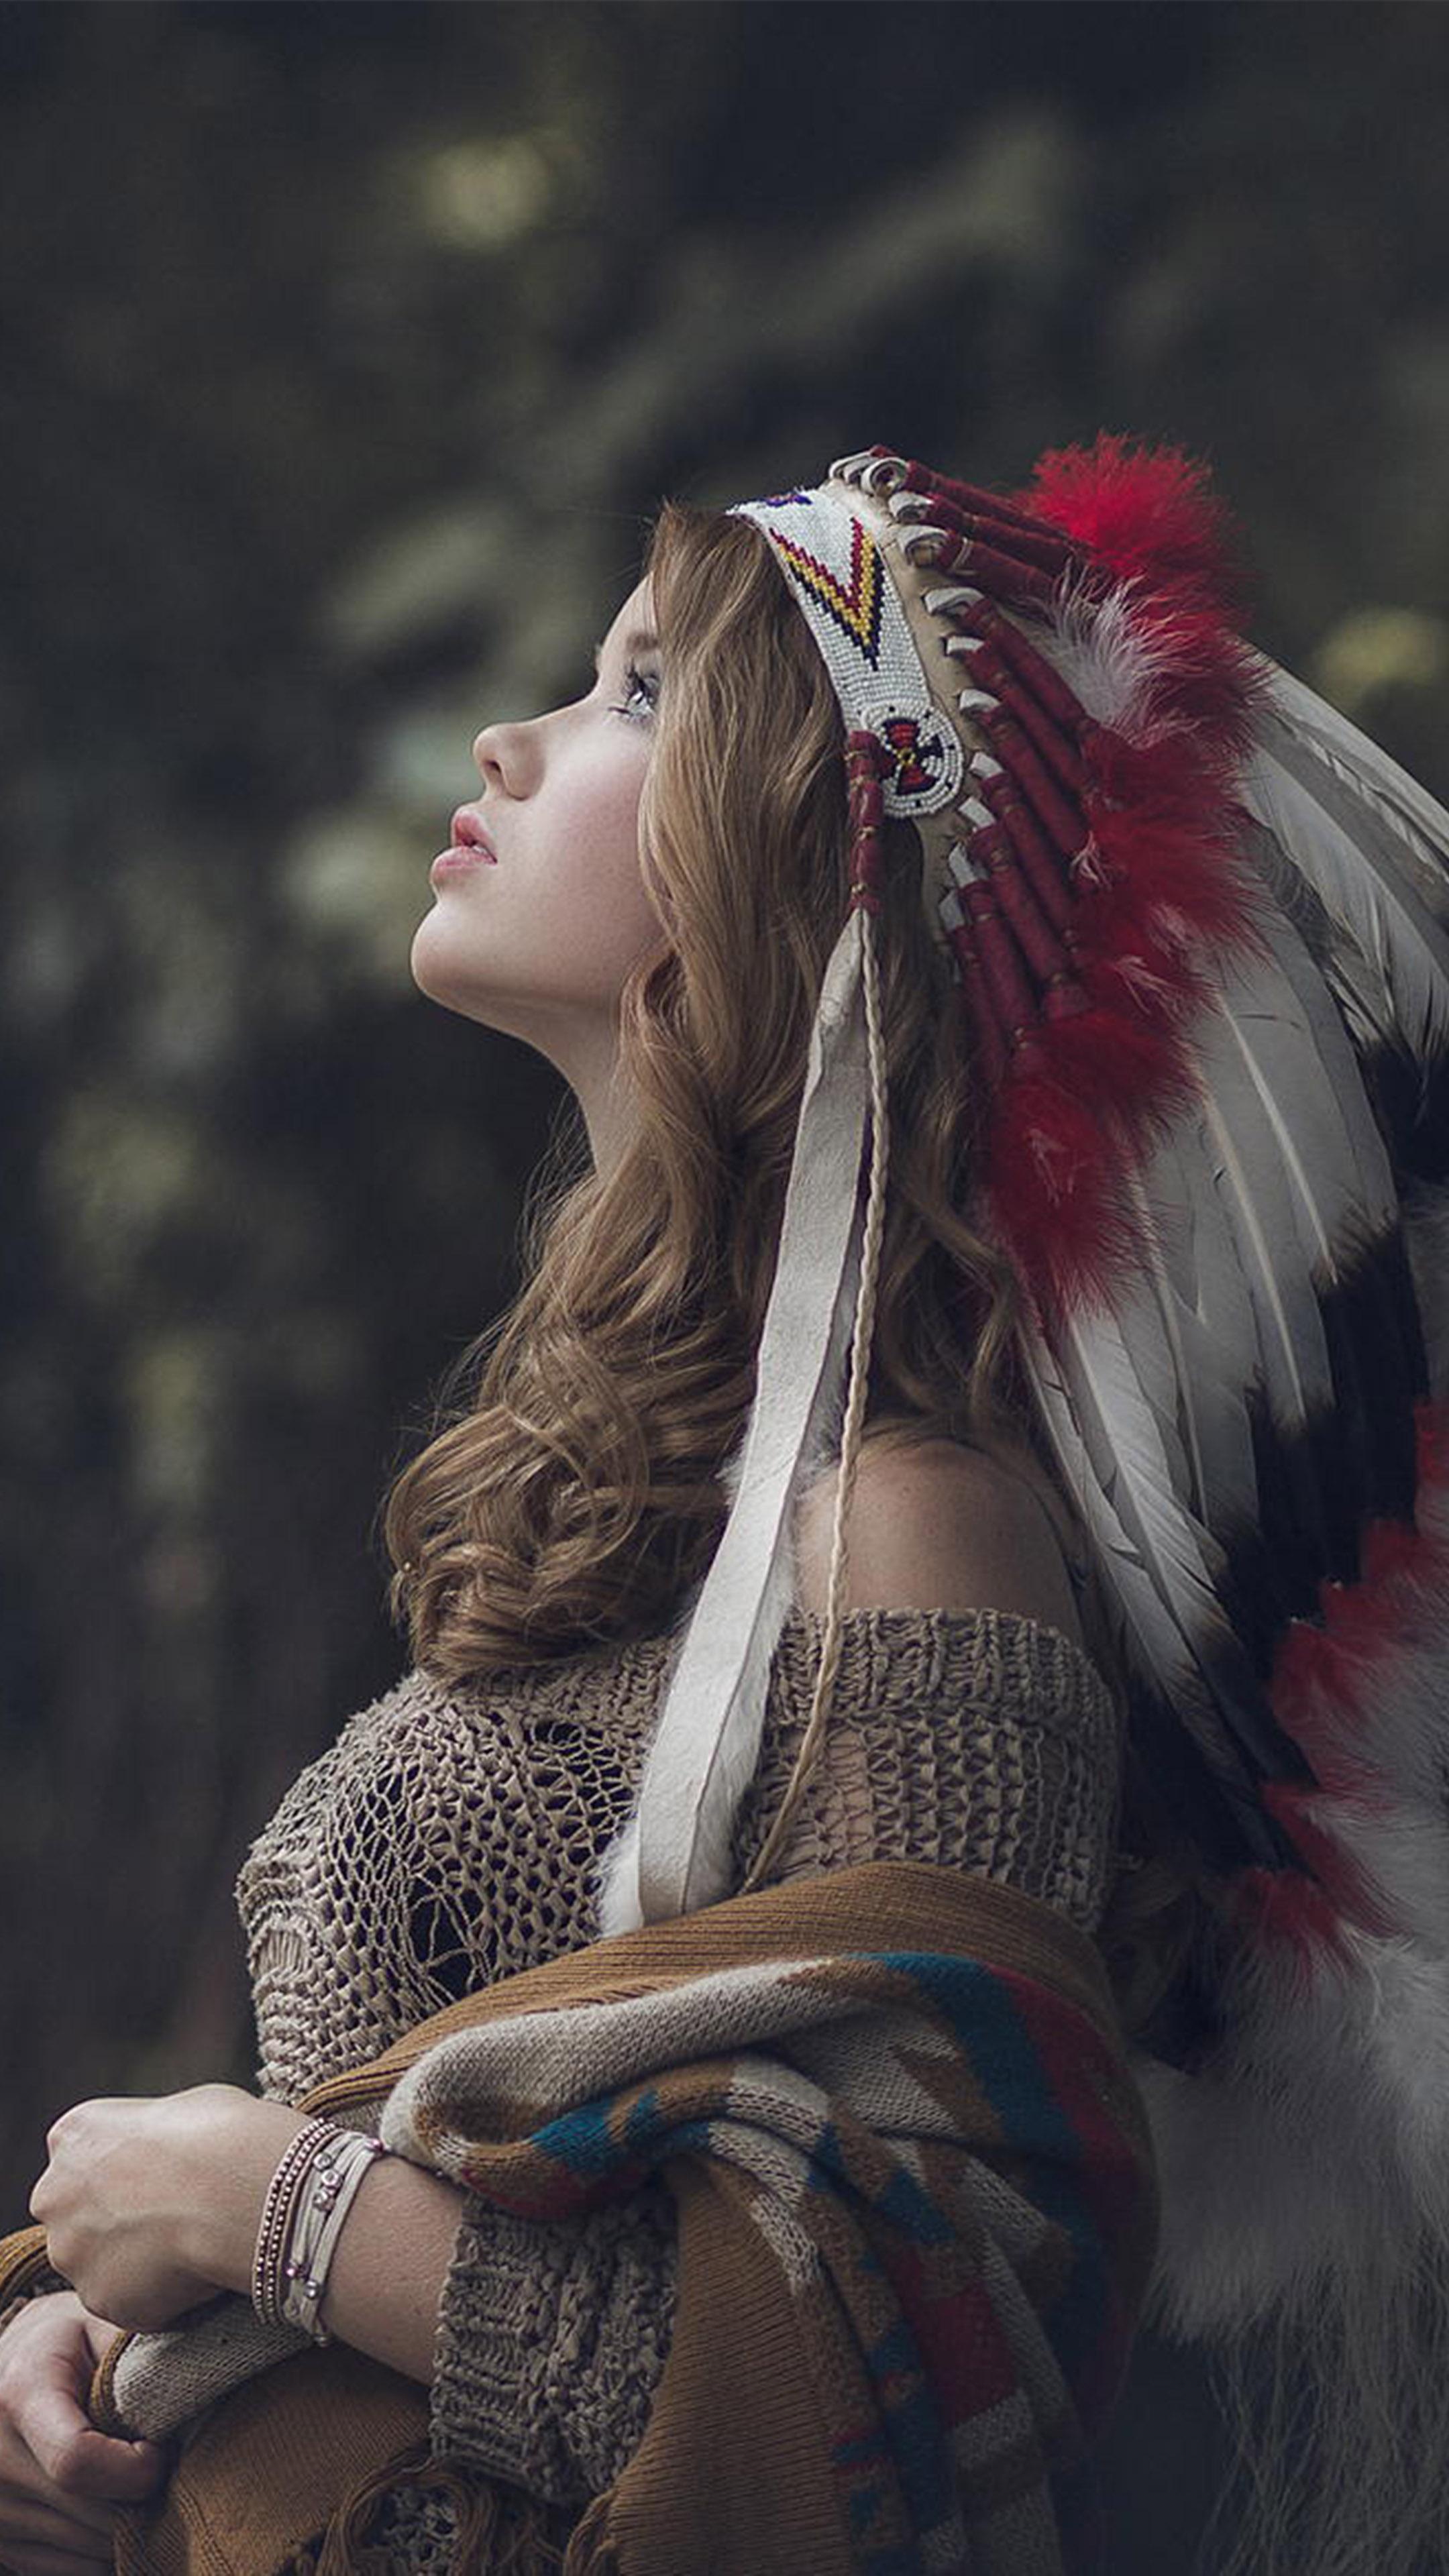 Beautiful Native American Free 4k Ultra Hd Mobile Wallpaper